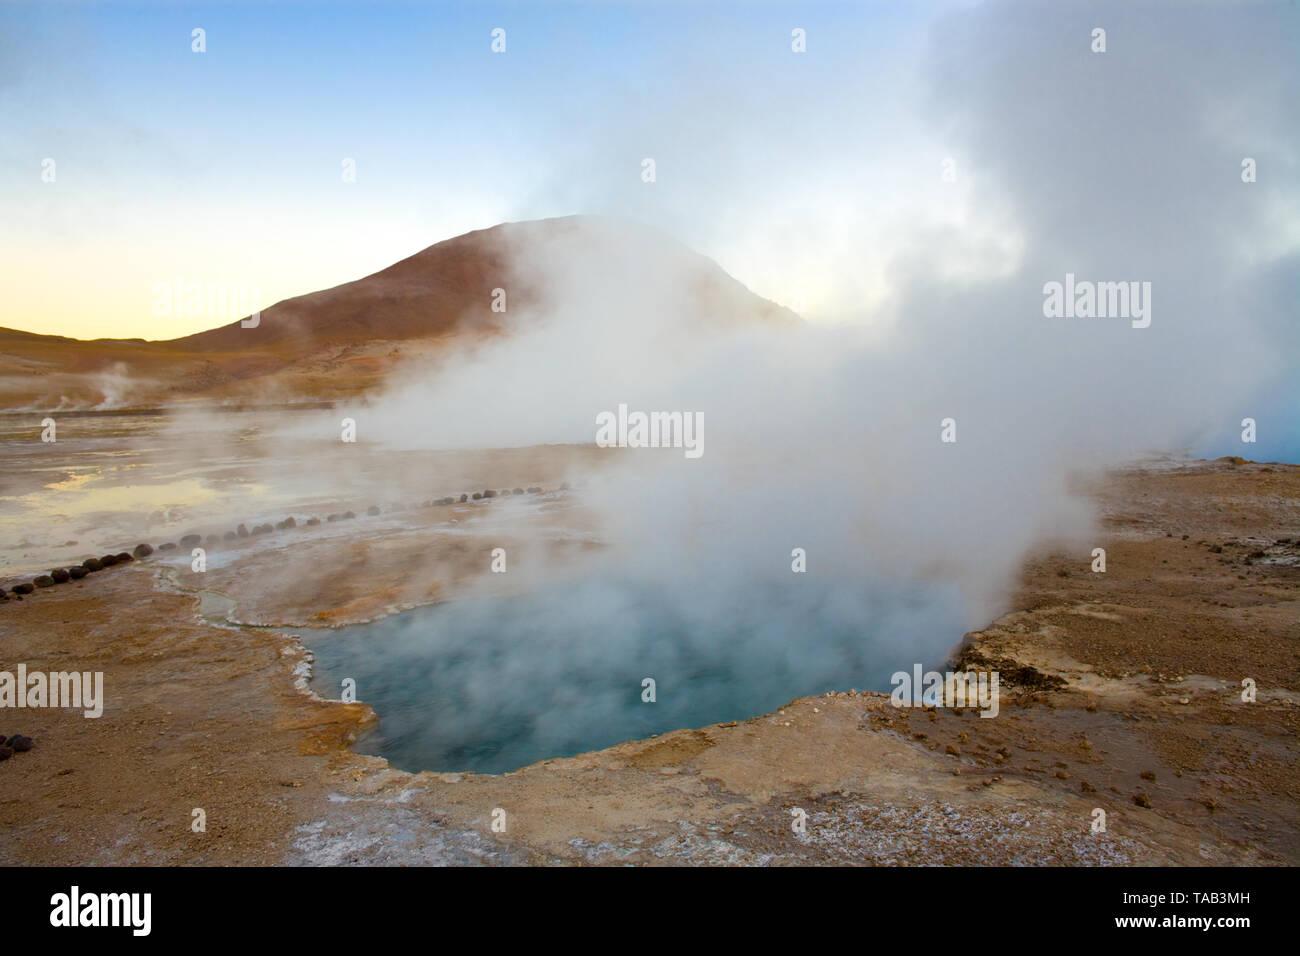 Natural hot spring pool at an altitude of 4300m, El Tatio Geysers, Atacama desert, Antofagasta Region, Chile, South America - Stock Image